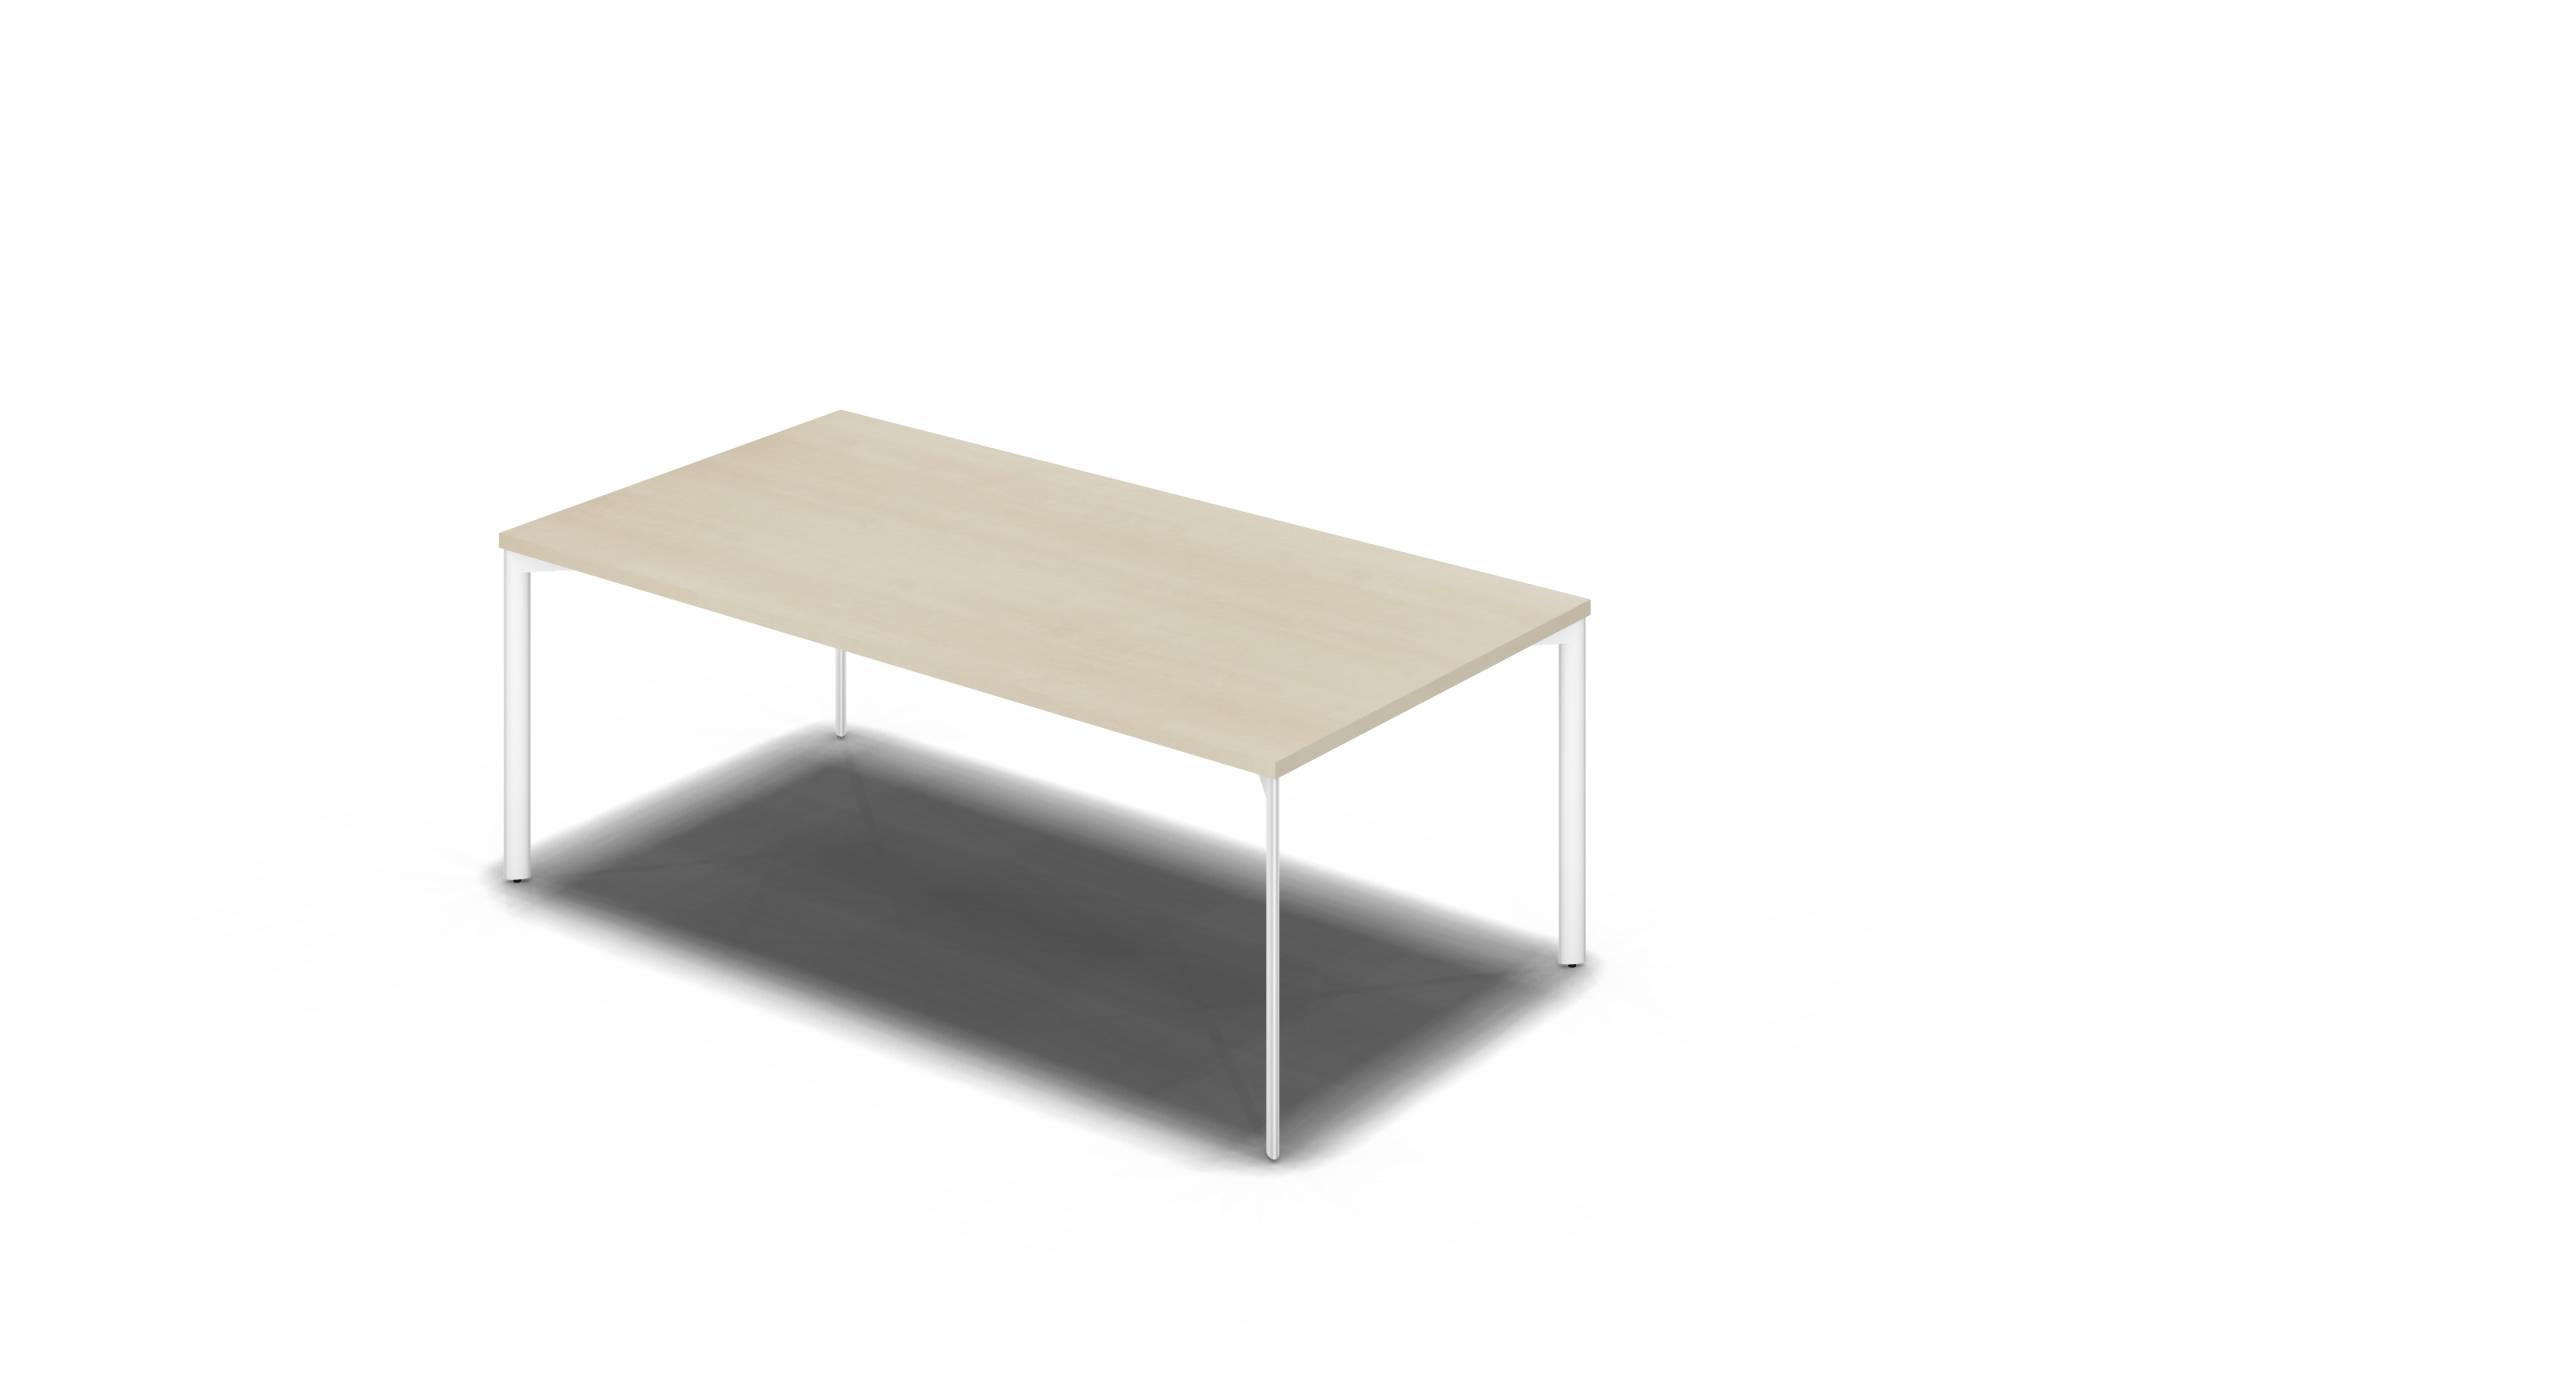 Table_Slim_1800x900_White_Maple_noOption